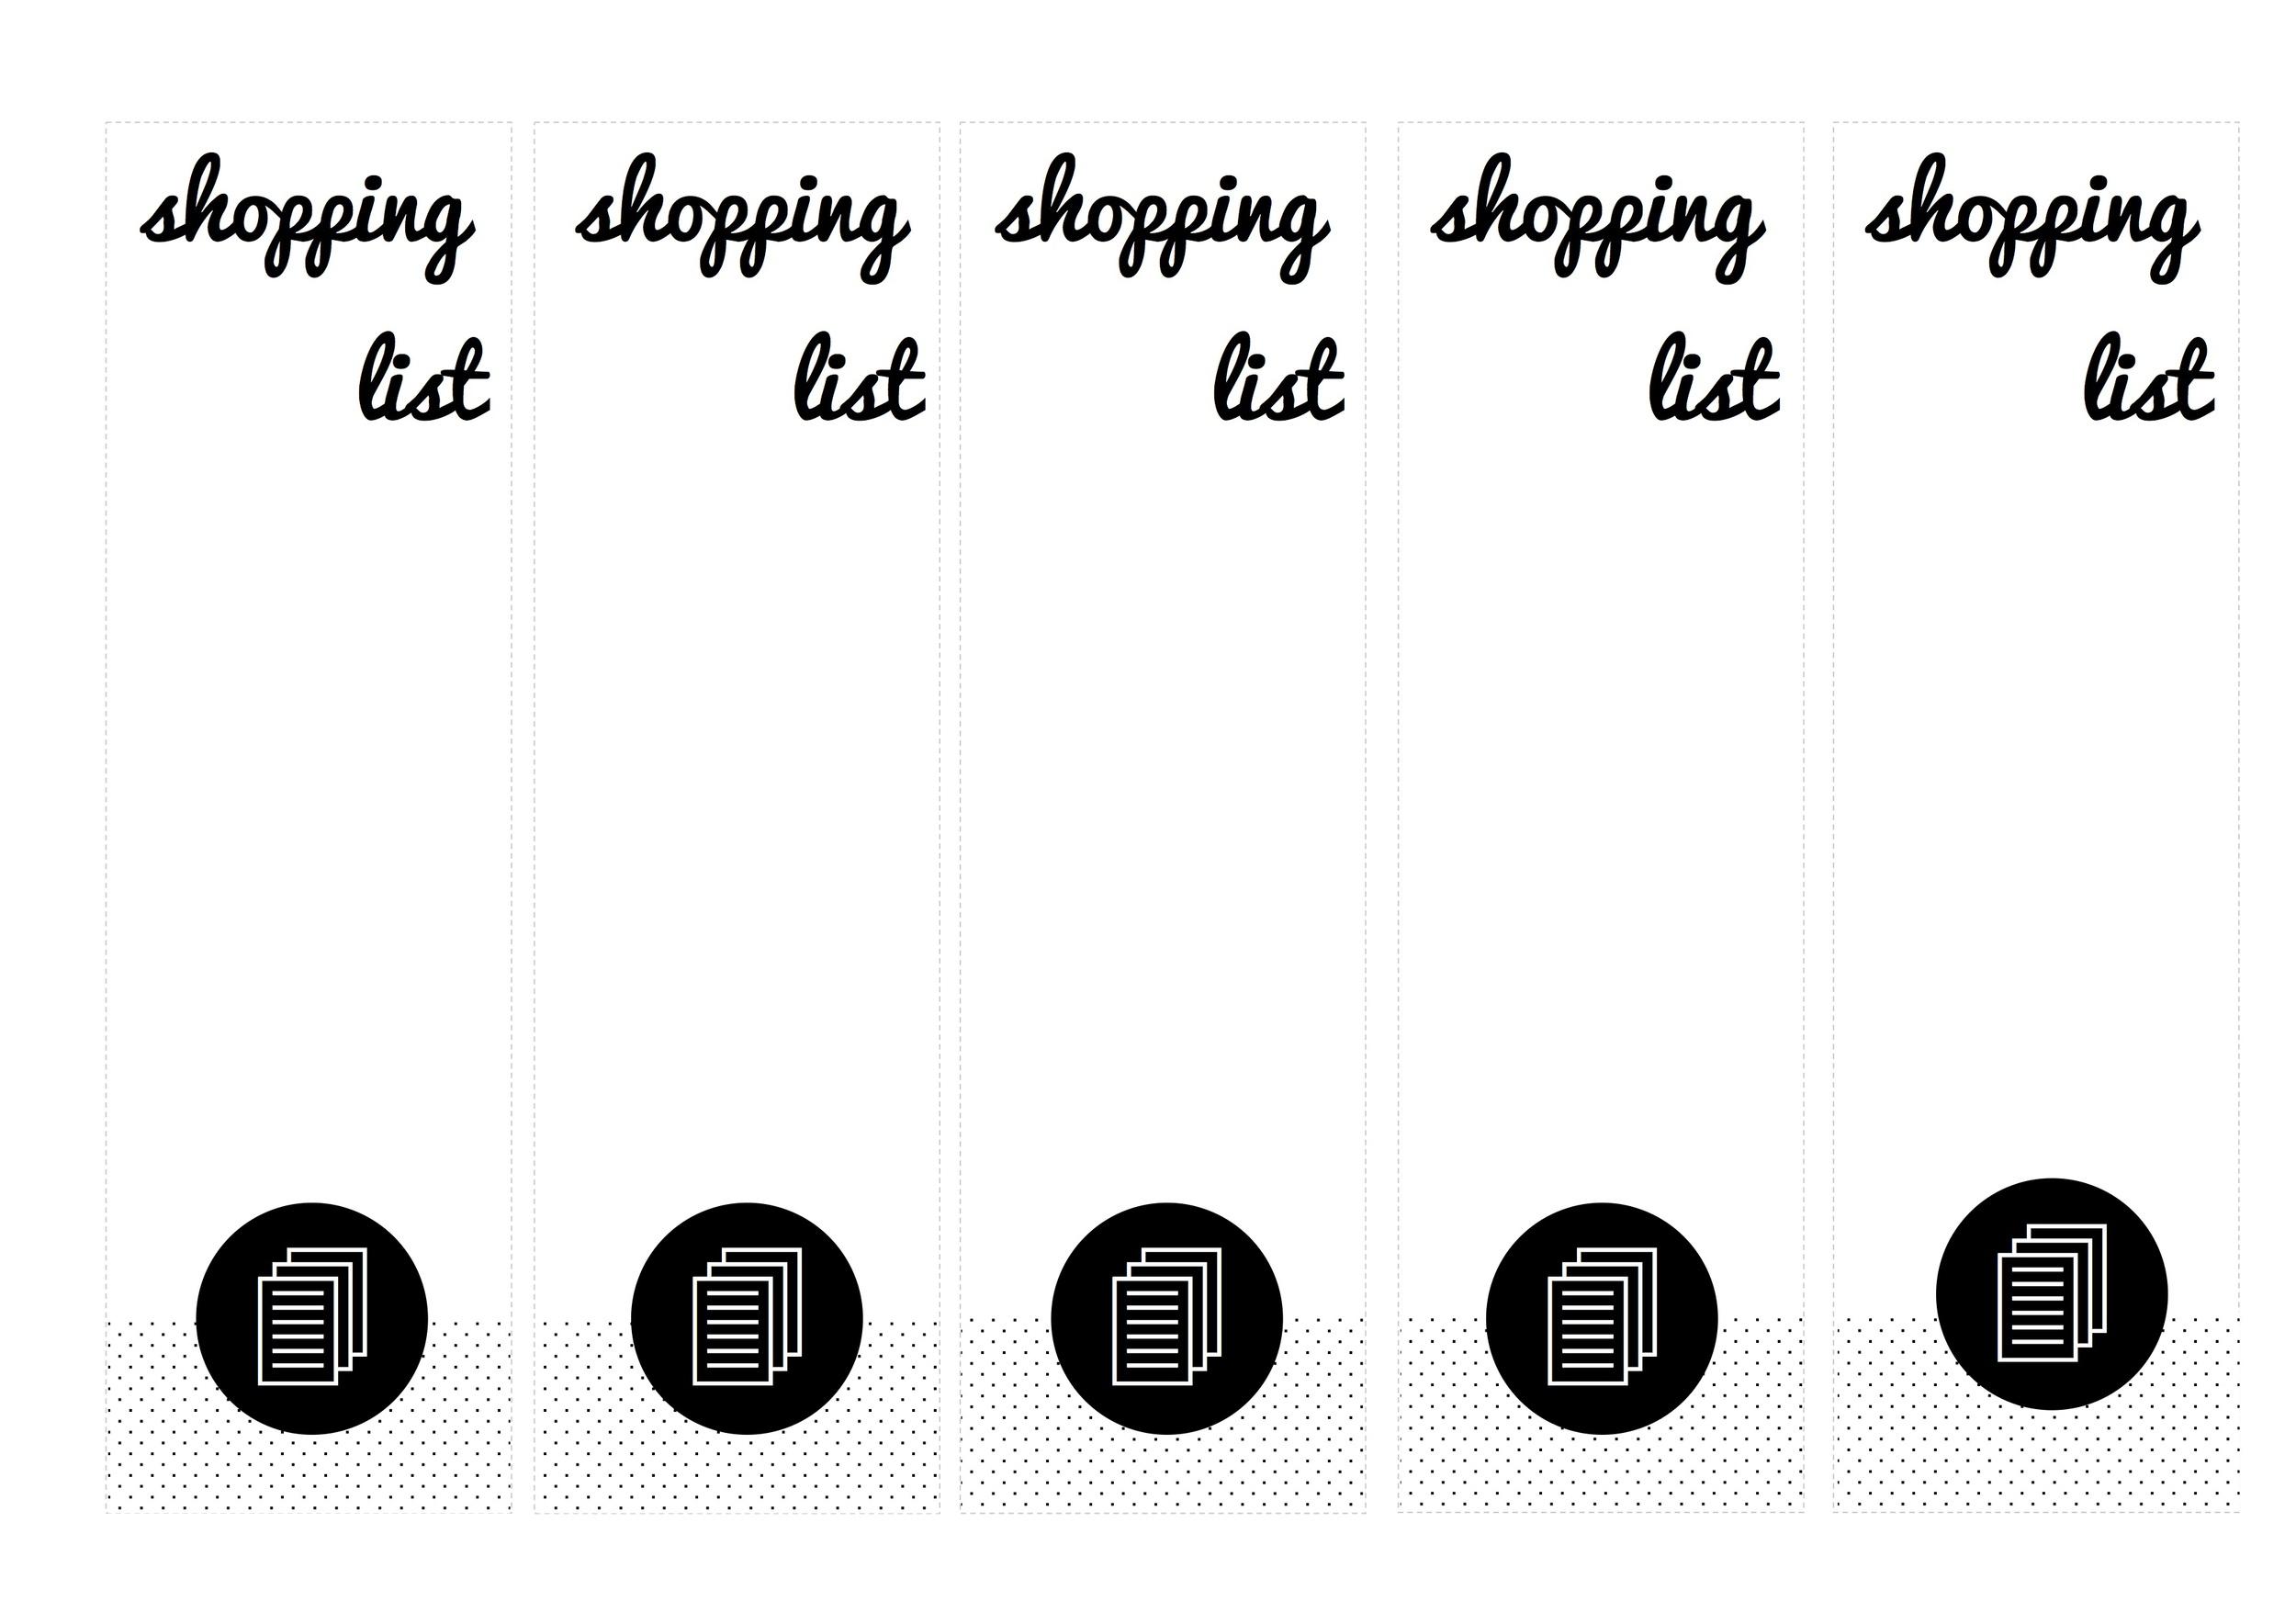 2014-10 - shopping lis.jpg